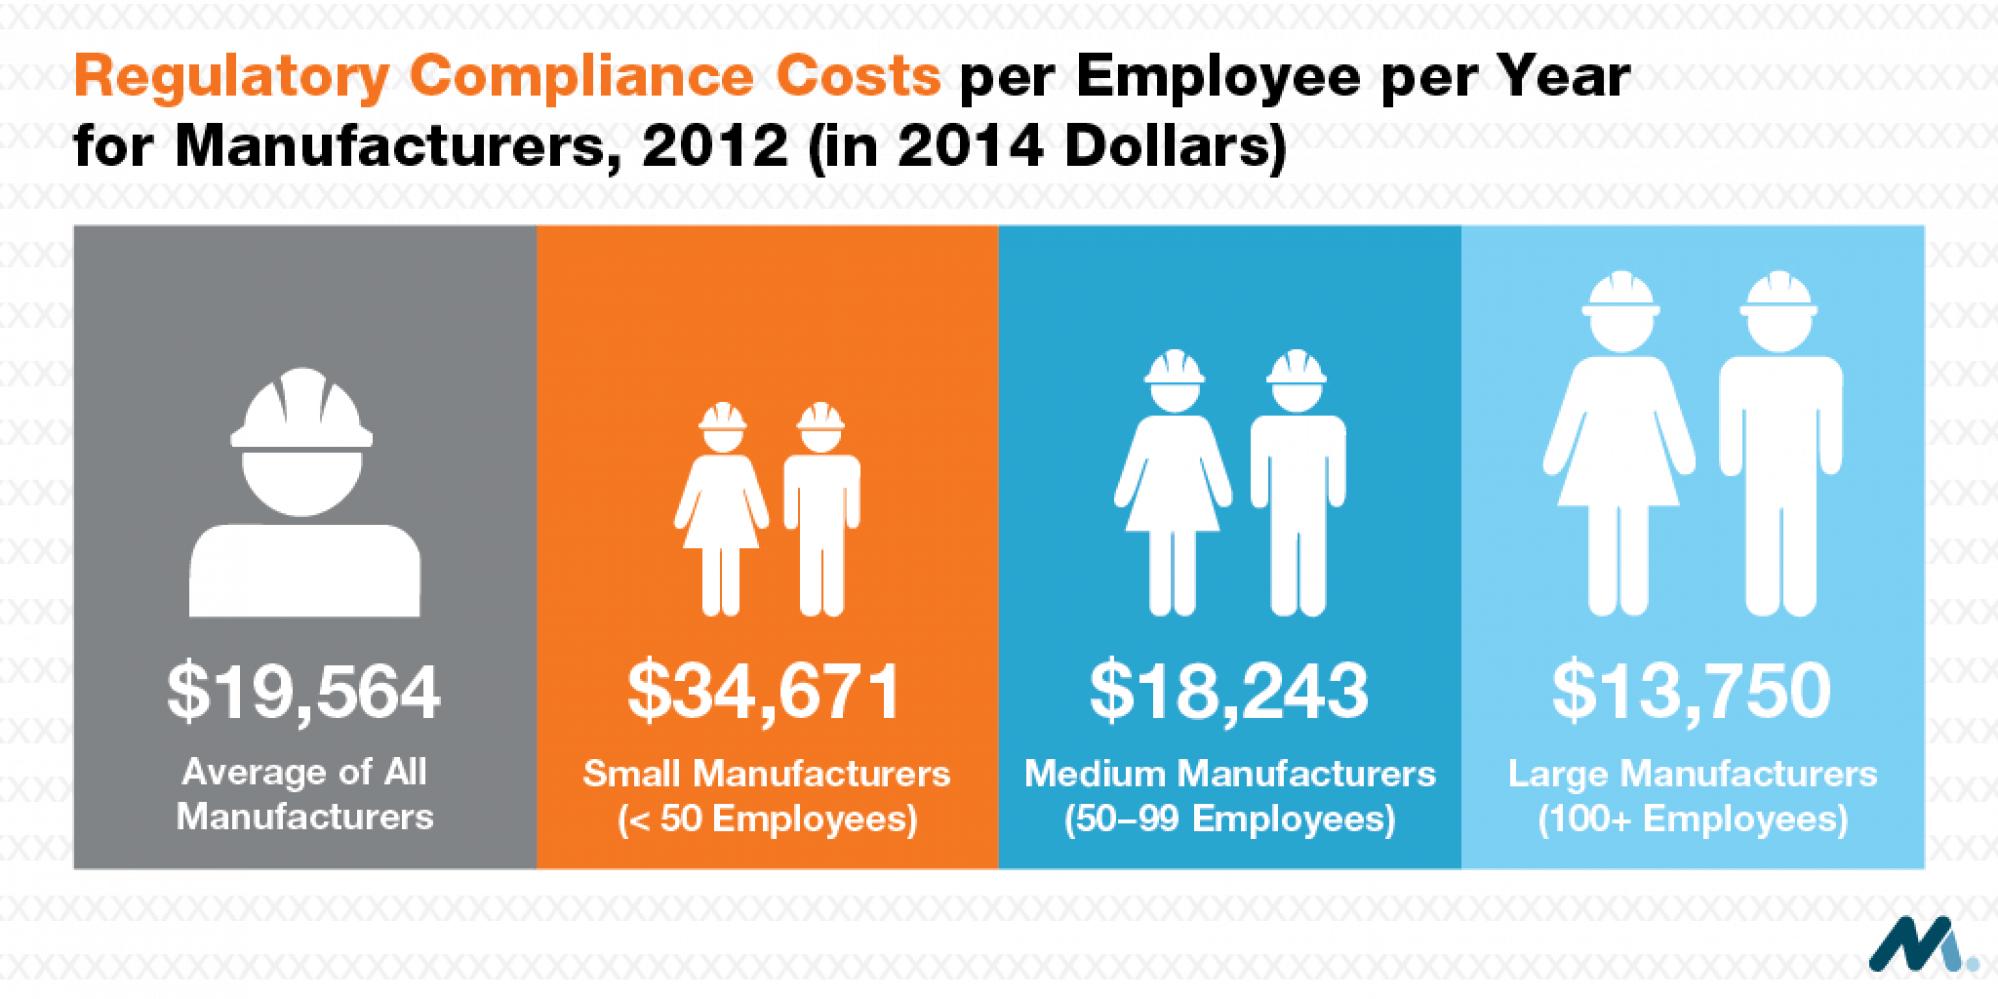 Regulatory Compliance Costs Graphic